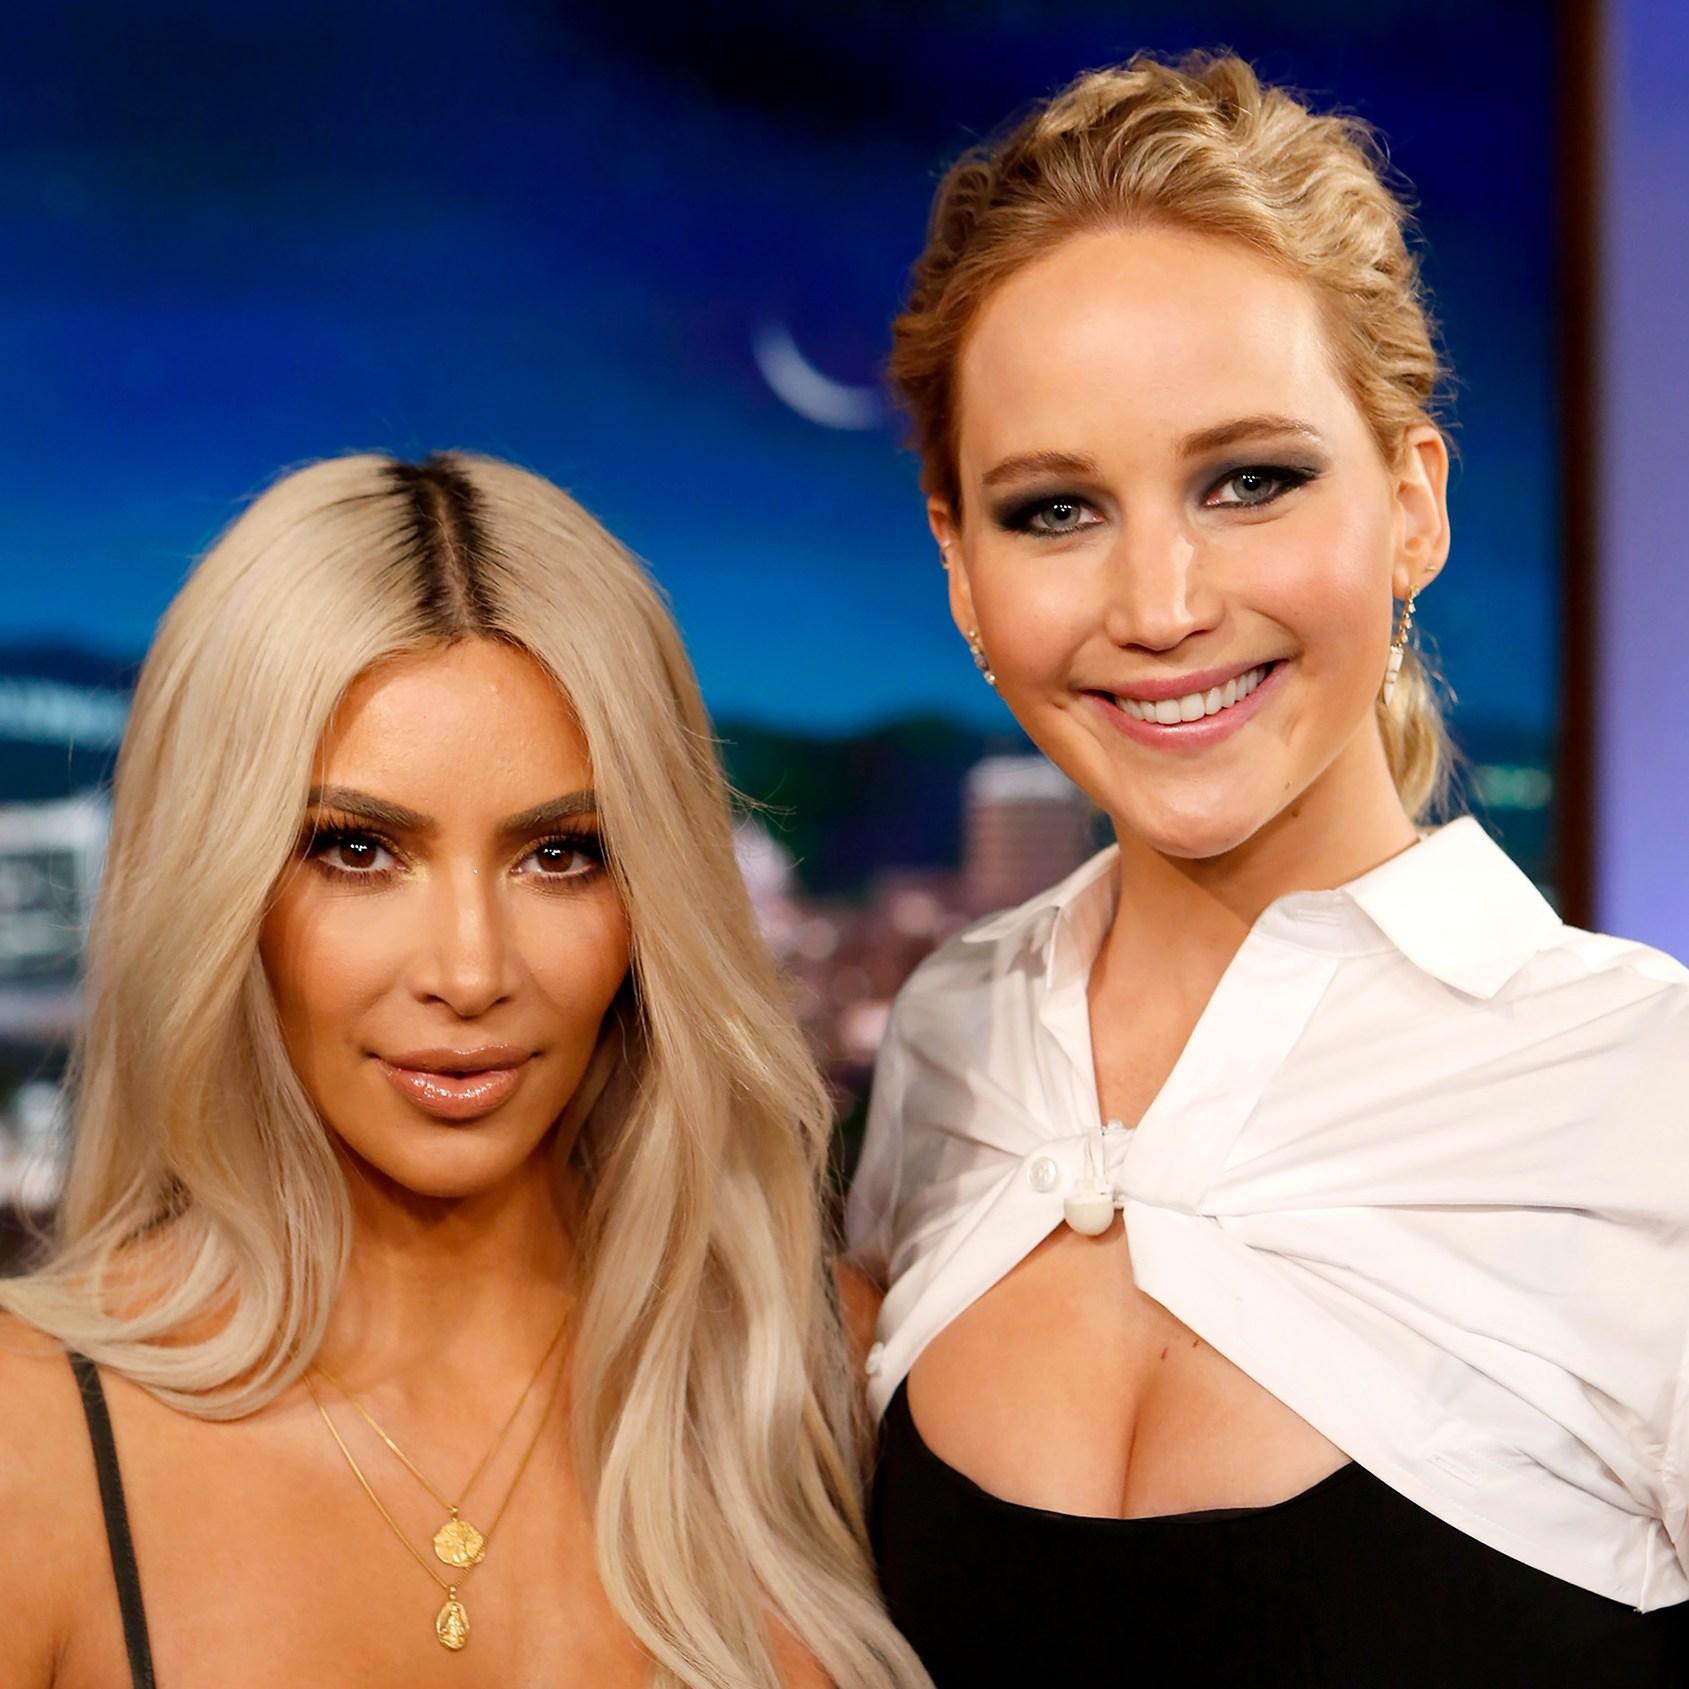 Kim Kardashian & Jennifer Lawrence